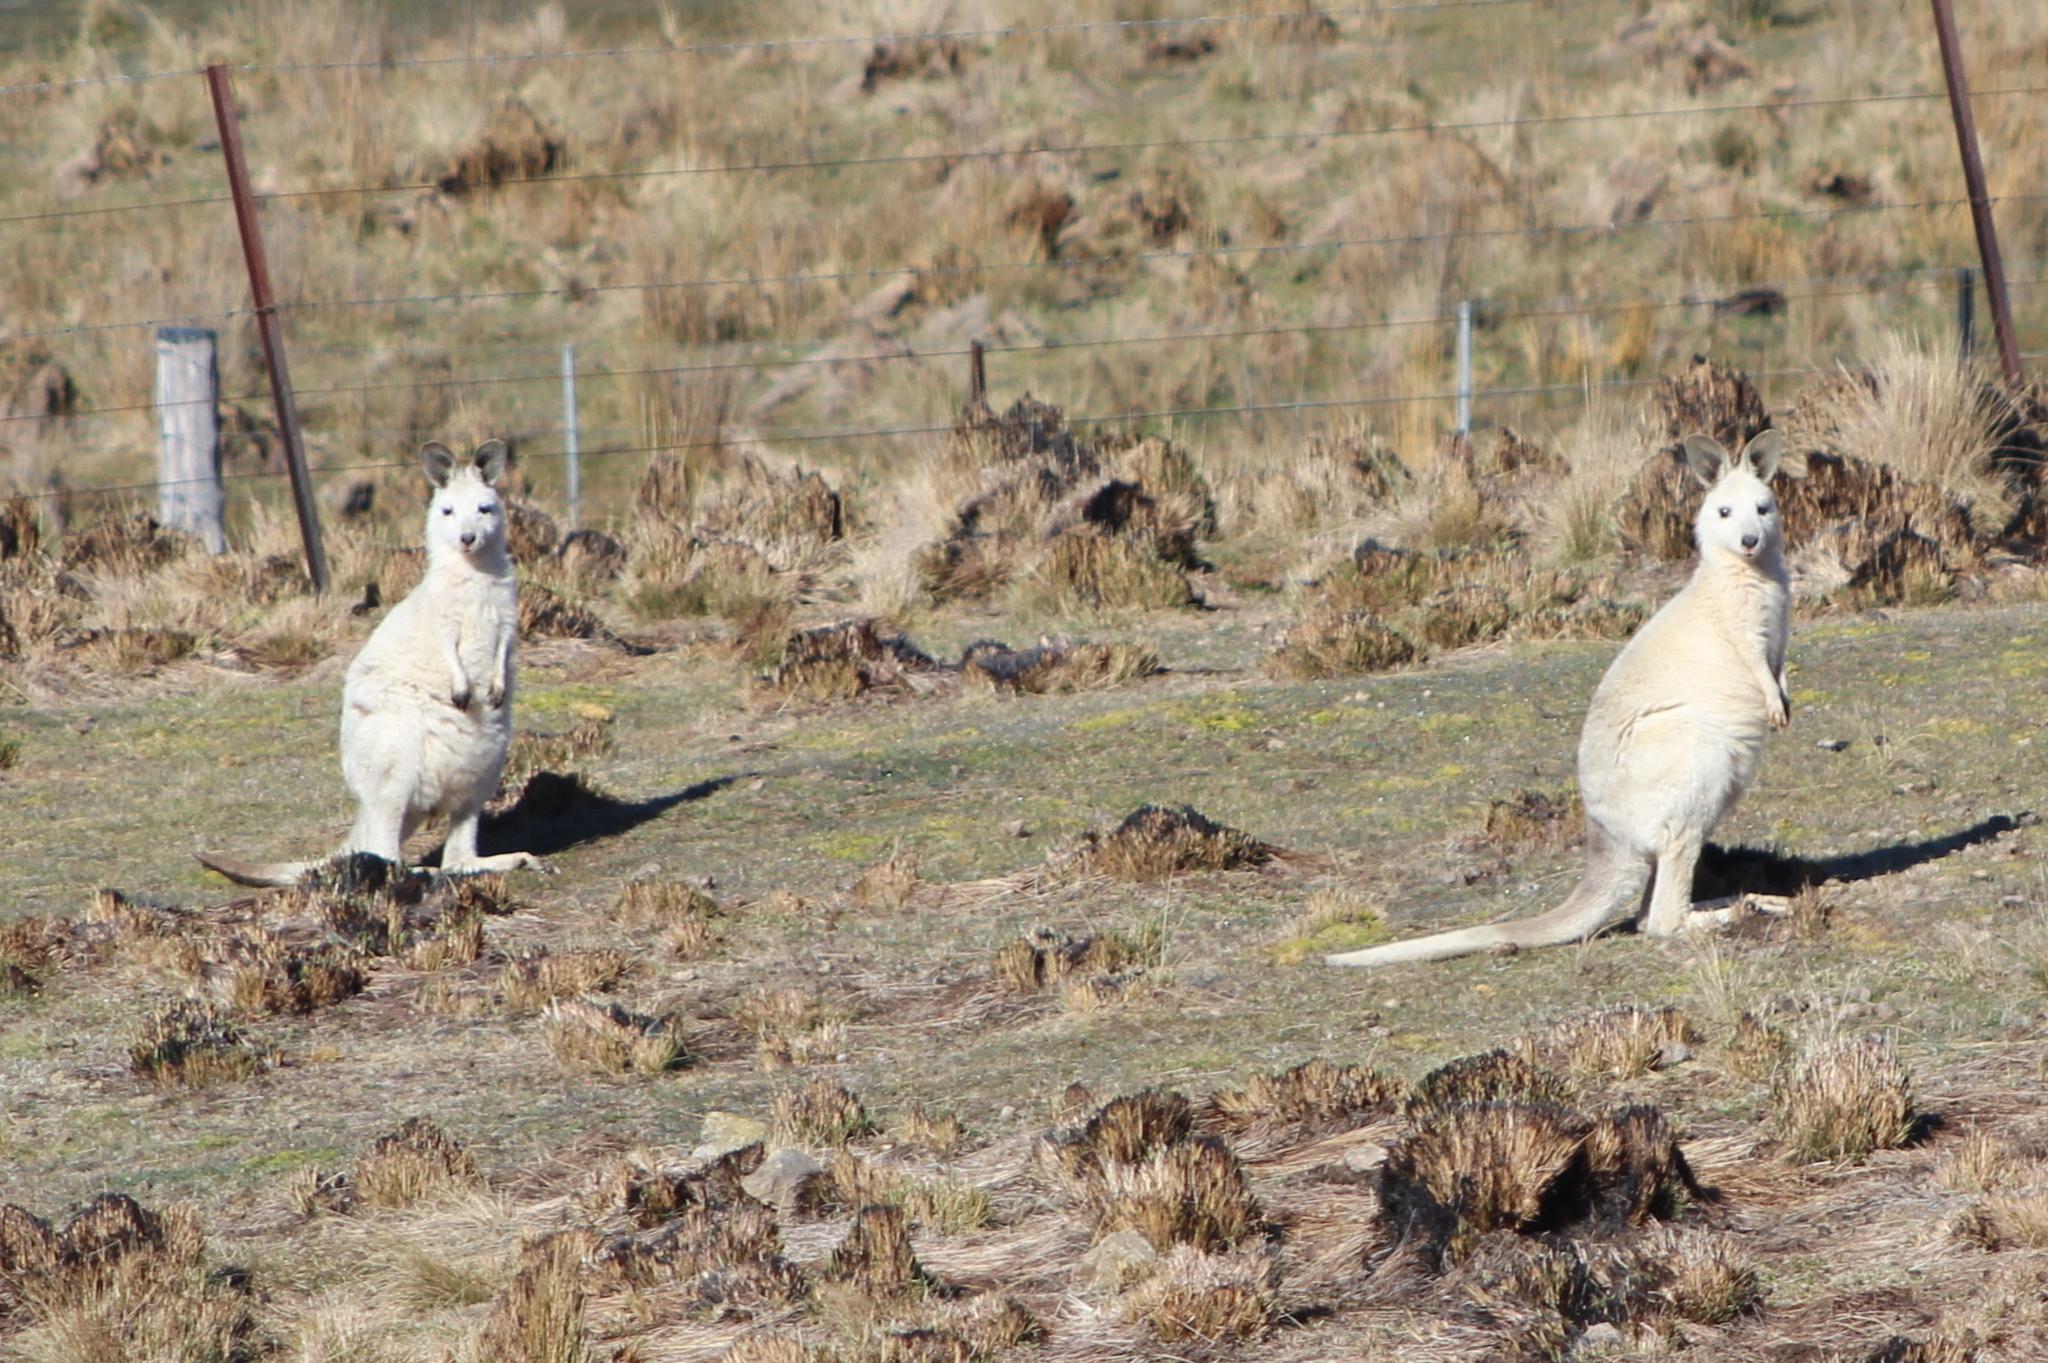 Image of Eastern Gray Kangaroo